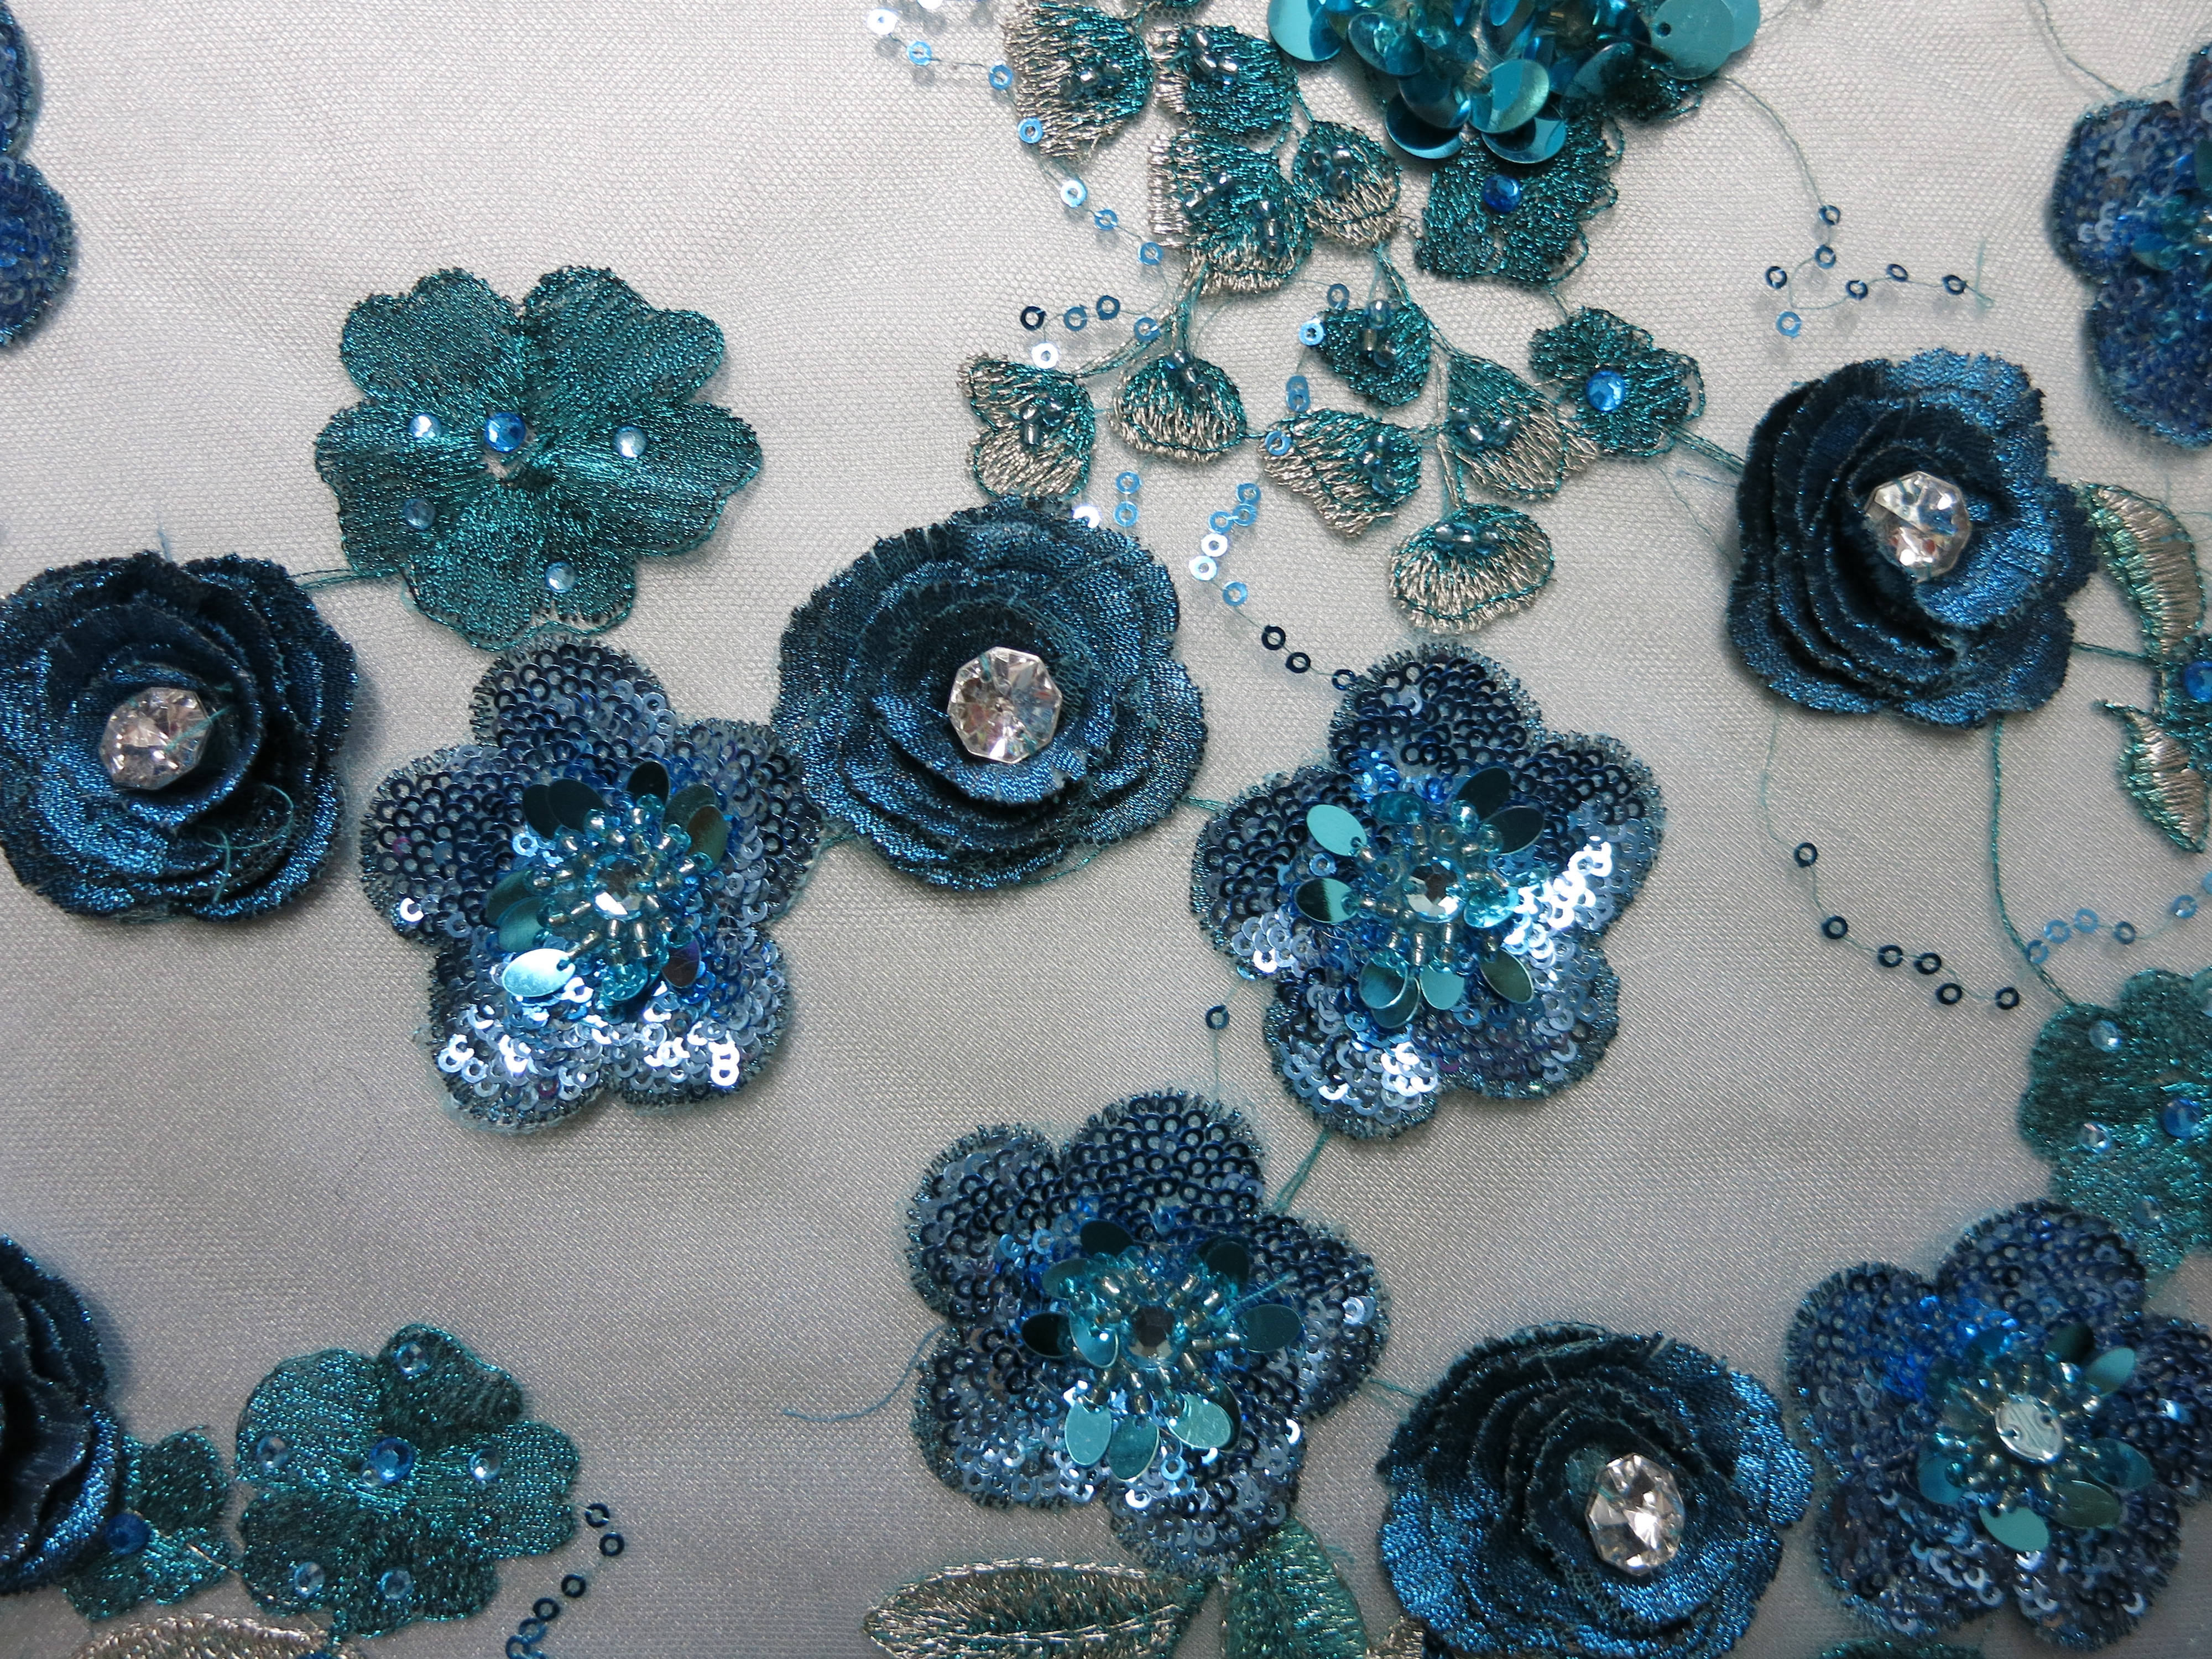 #12Hand014 - Turquoise